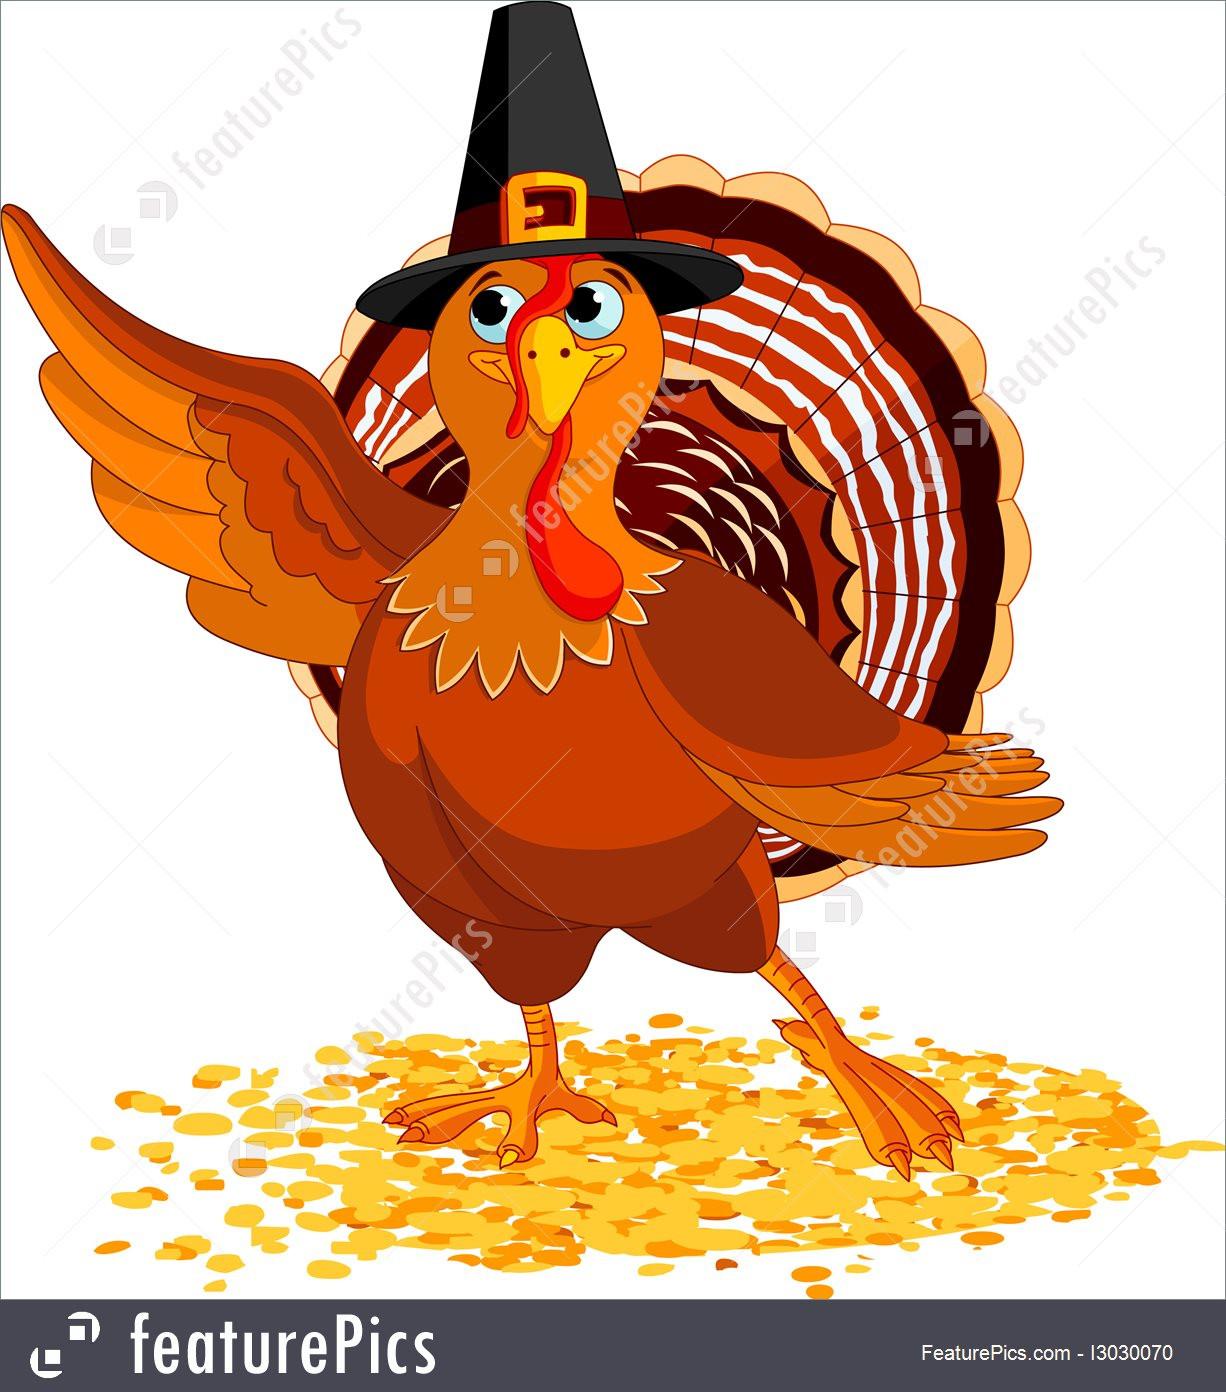 When Should I Buy My Turkey For Thanksgiving  Holidays Thanksgiving Turkey Presenting Stock